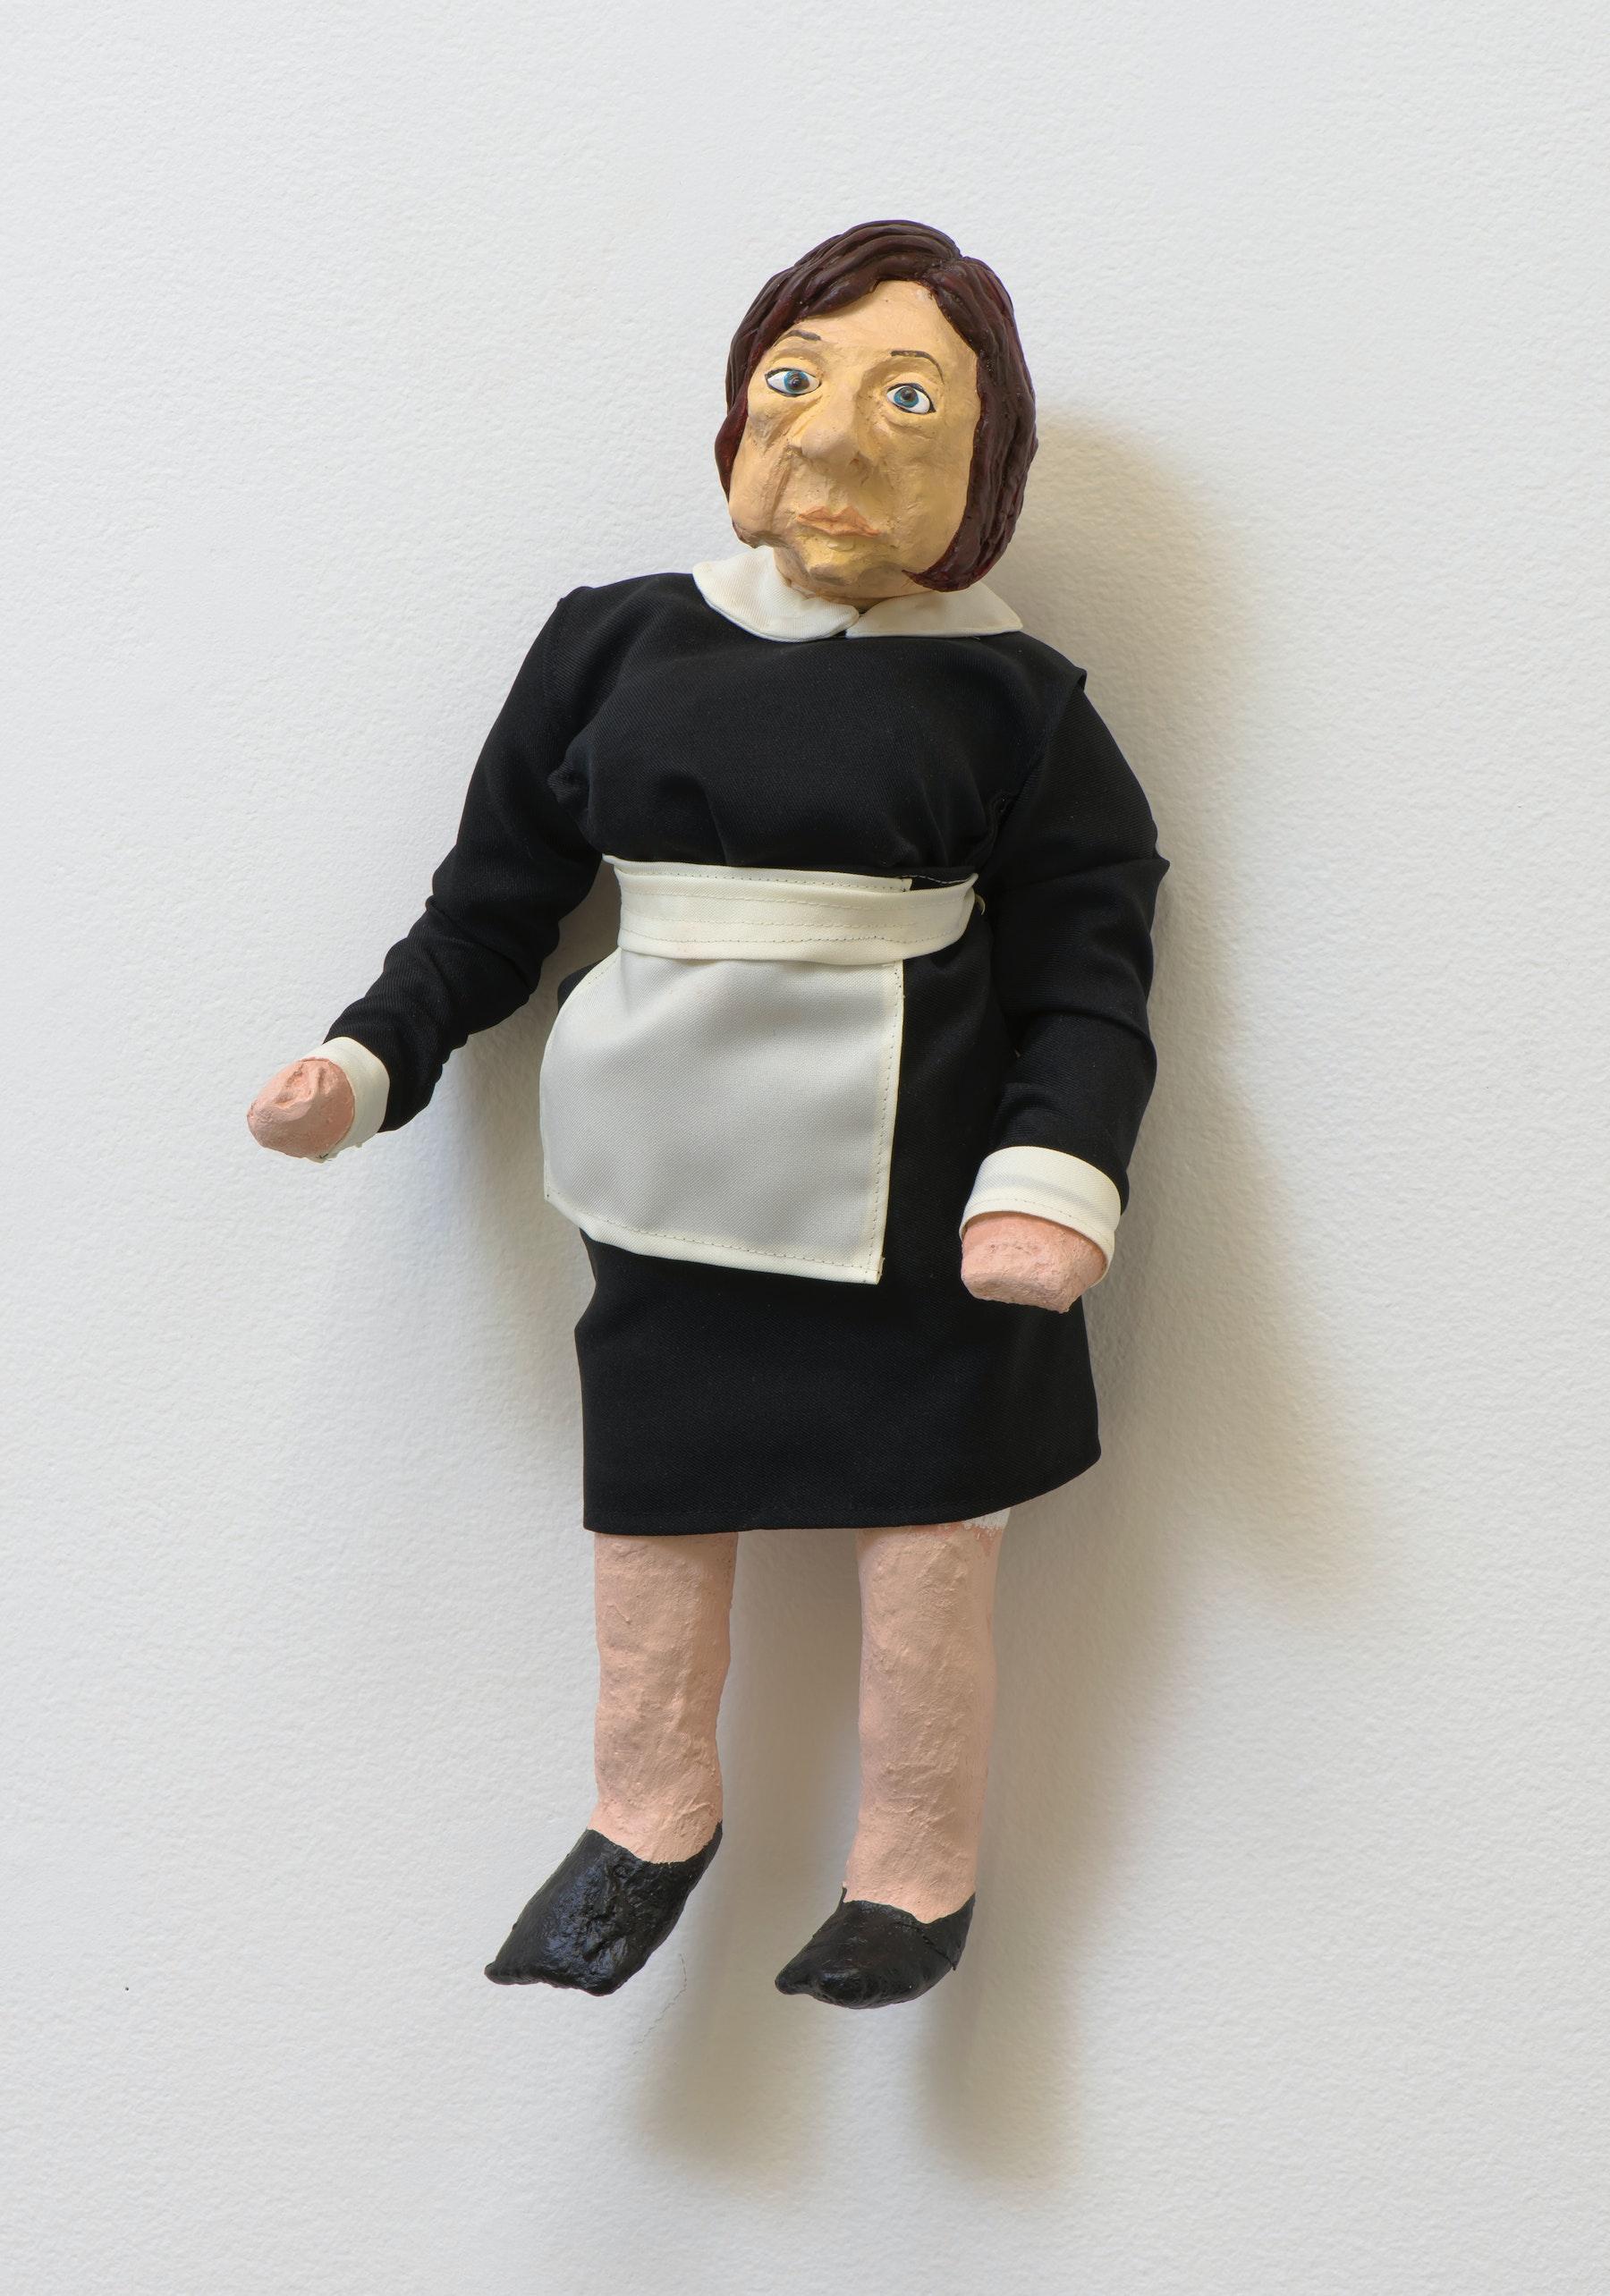 "My Barbarian ""Brigitte (doll),"" 2014 20.25"" H x 10"" W x 5"" D (51.44 cm H x 25.4 cm W x 12.7 cm D) Inventory #MBB202 Courtesy of Vielmetter Los Angeles Photo credit: Robert Wedemeyer"